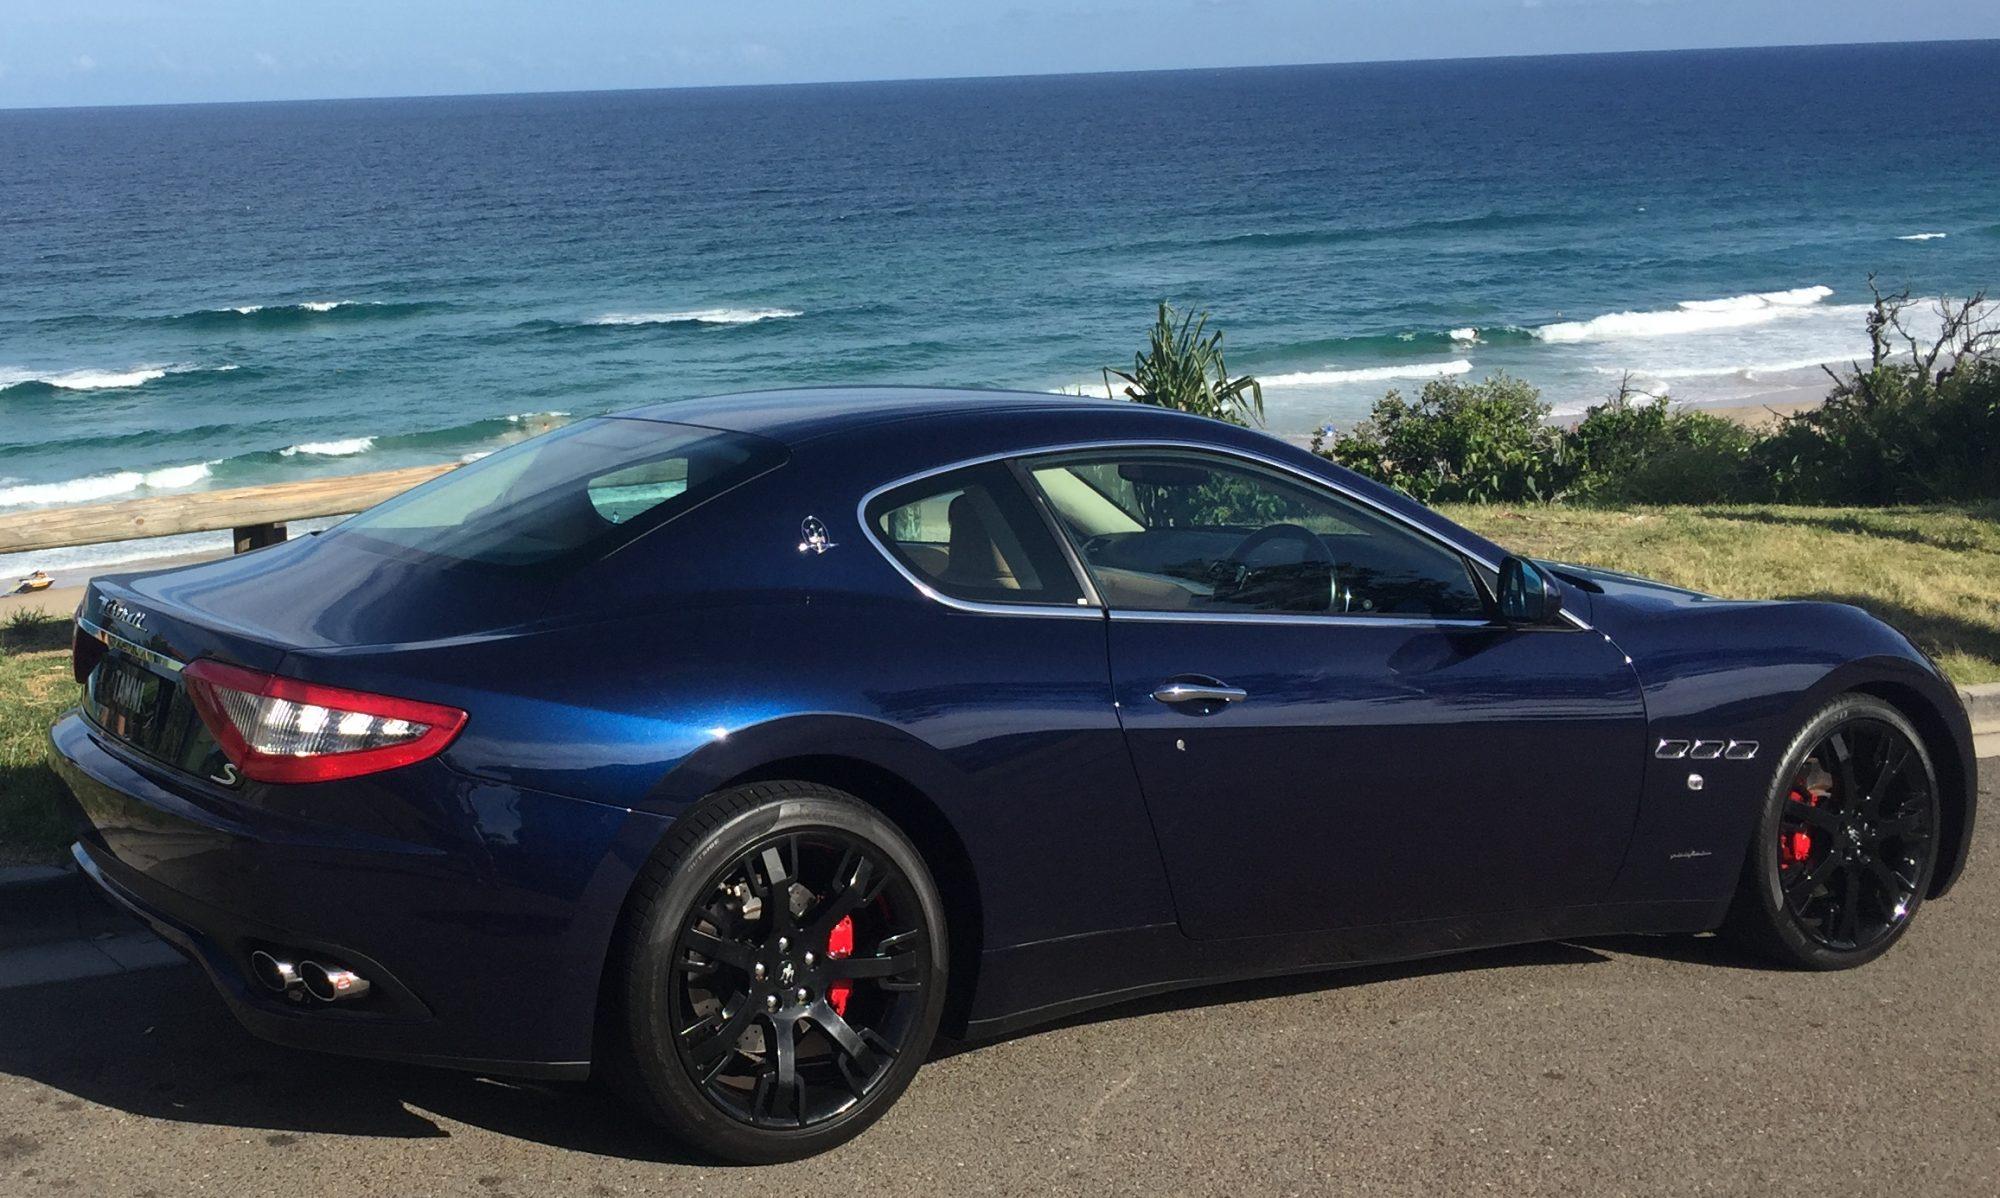 Maserati Granturismo Exotic Supercar Exotic Sports Car Rental Noosa Heads, Sunshine Coast Queensland